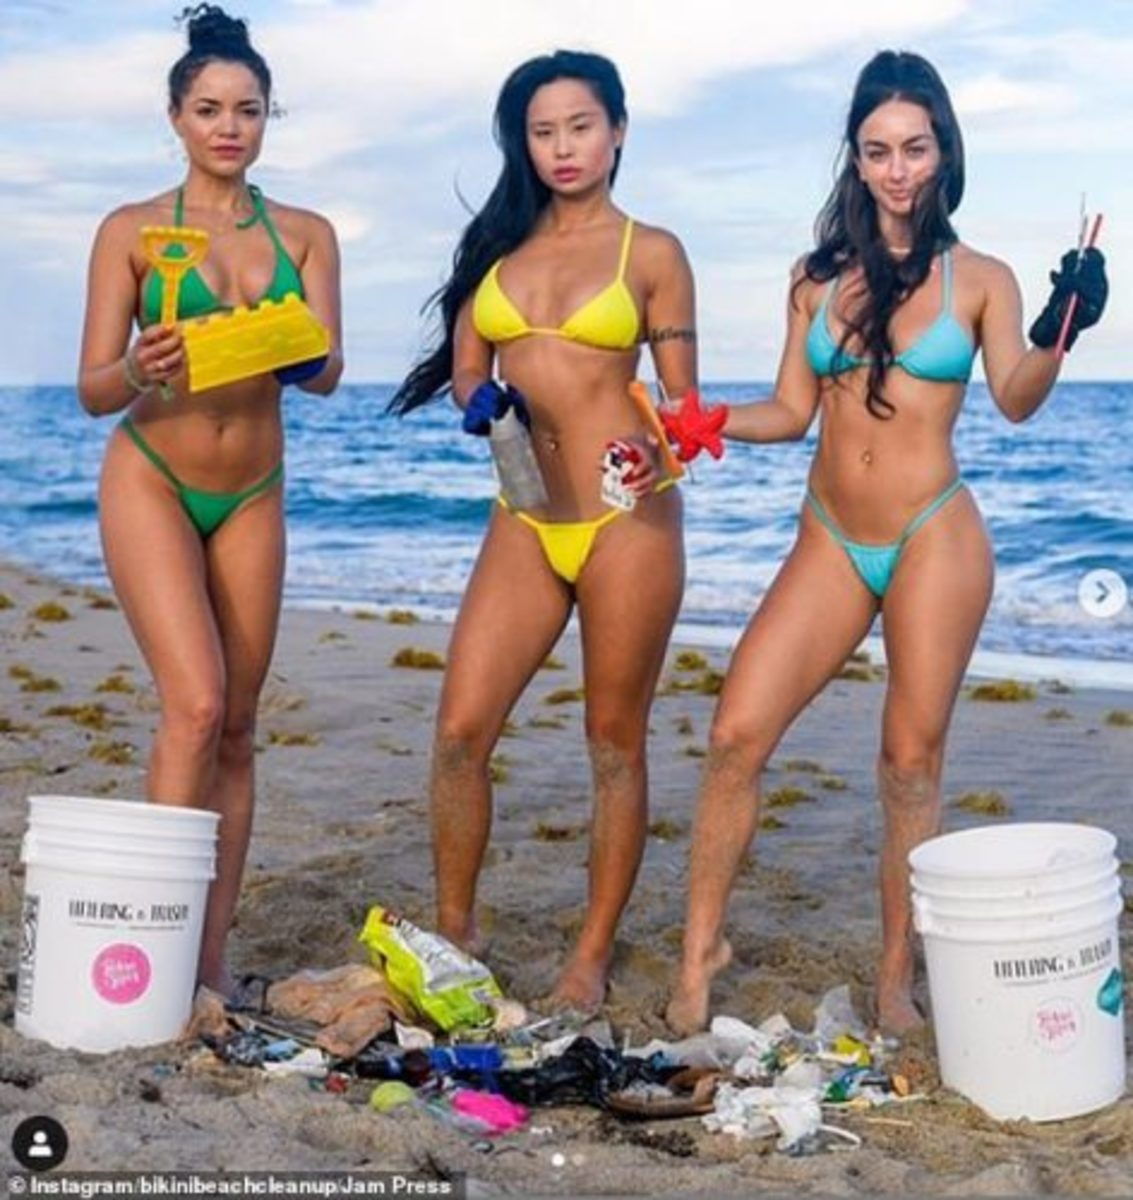 bikini-beach-cleanup-1-472x500